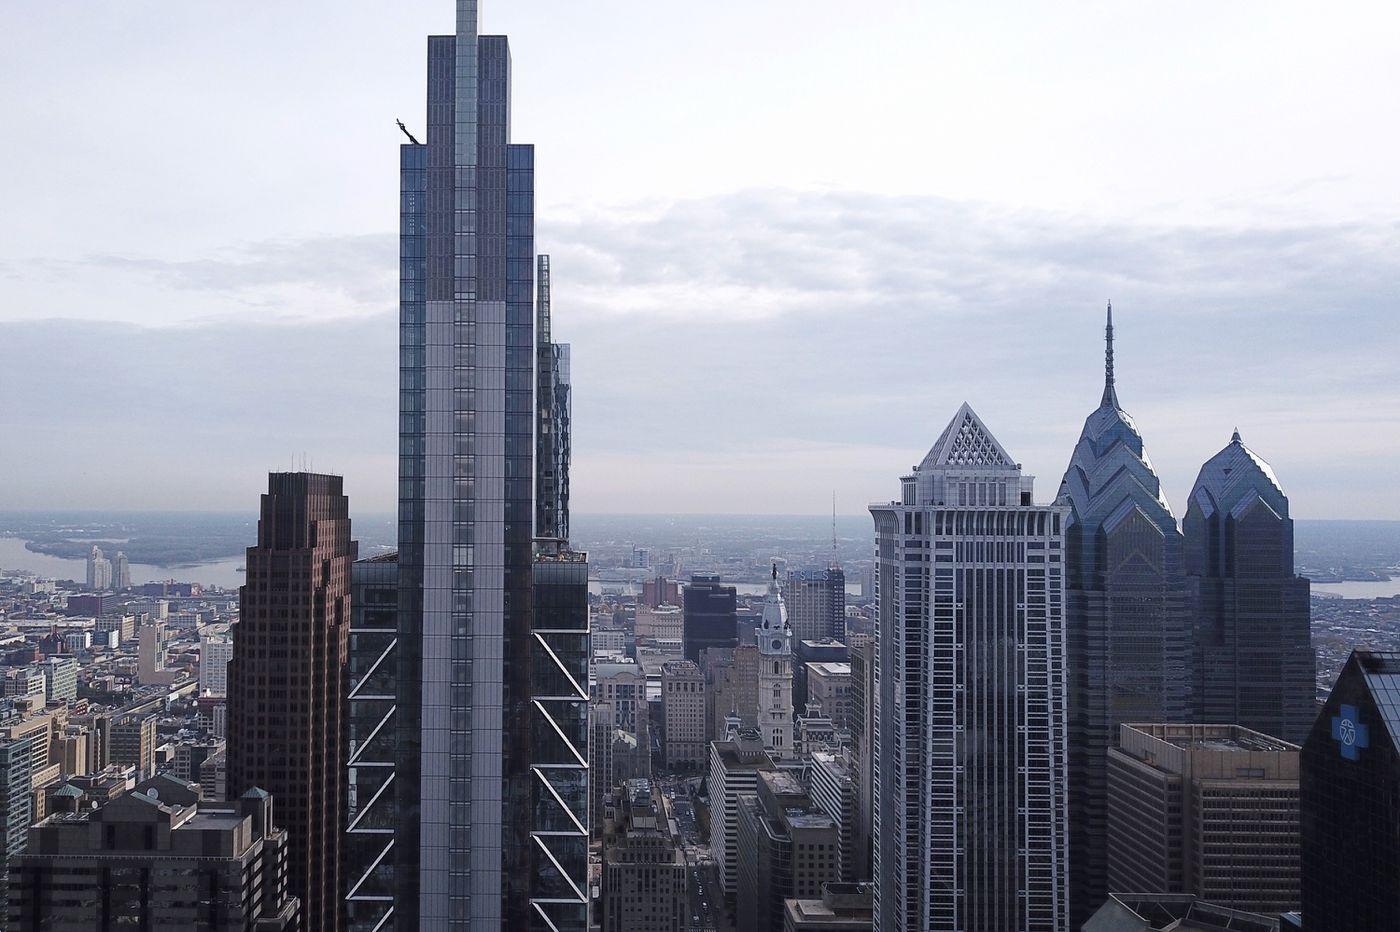 Philadelphia's skyline rising: From a colonial church spire to glassy blue Comcast 2